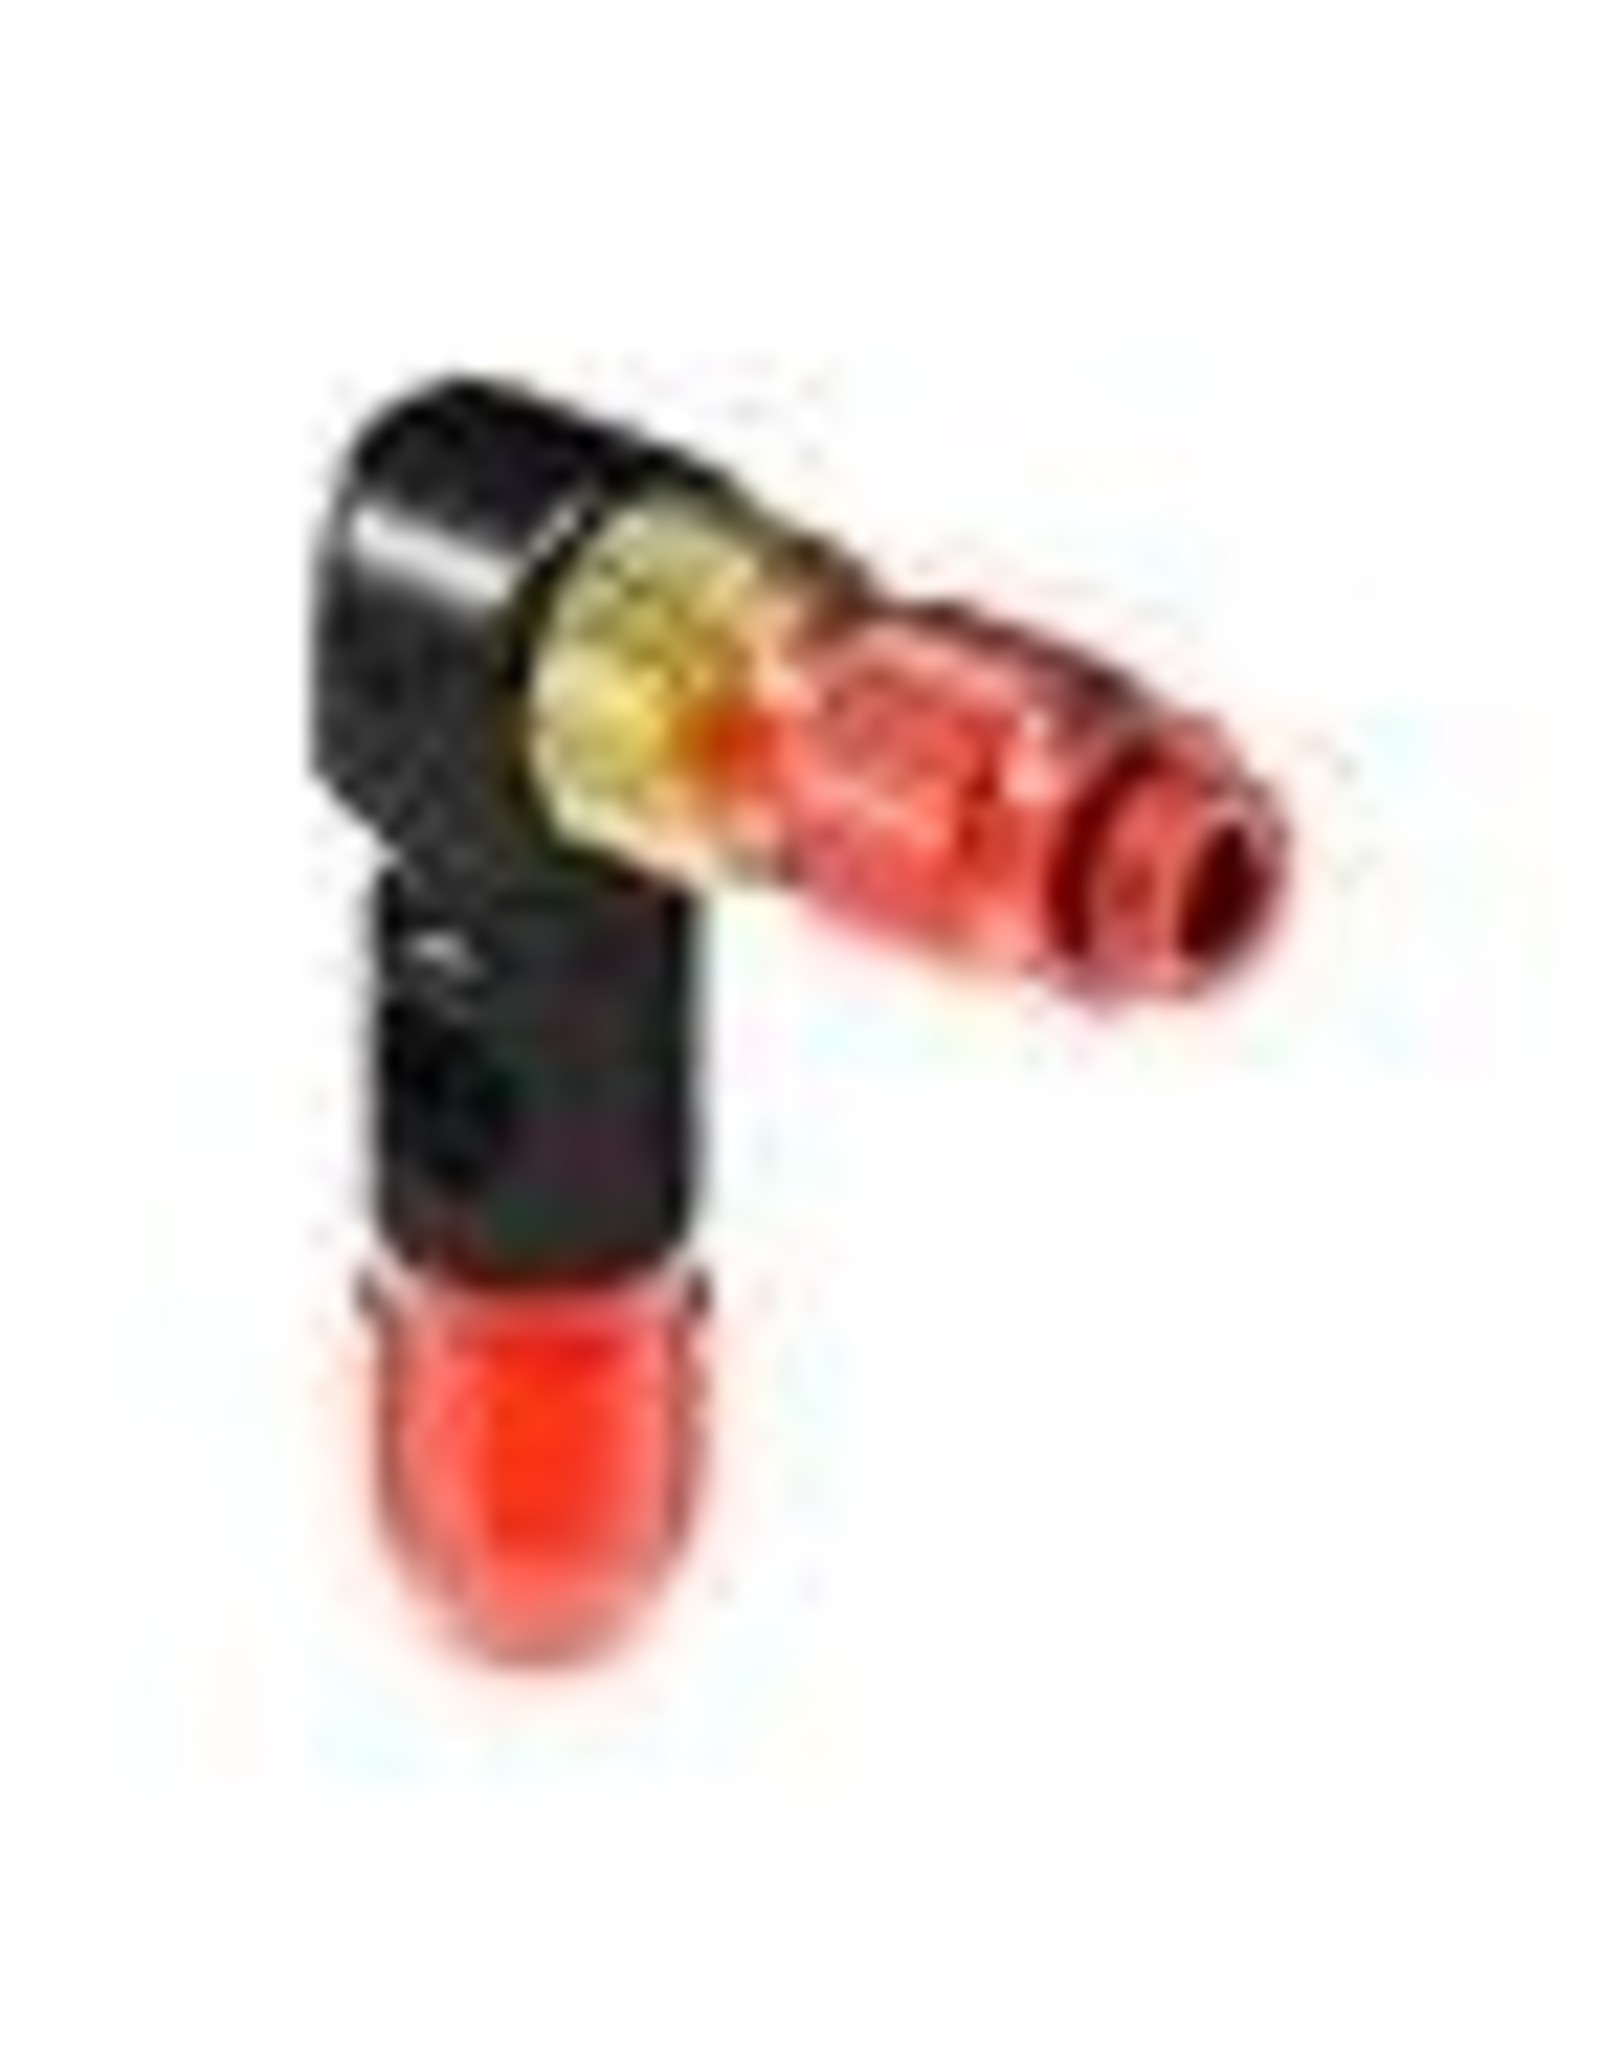 Lezyne, ABS-1 PRO HP, Tete de pompe, Rouge, Tressee